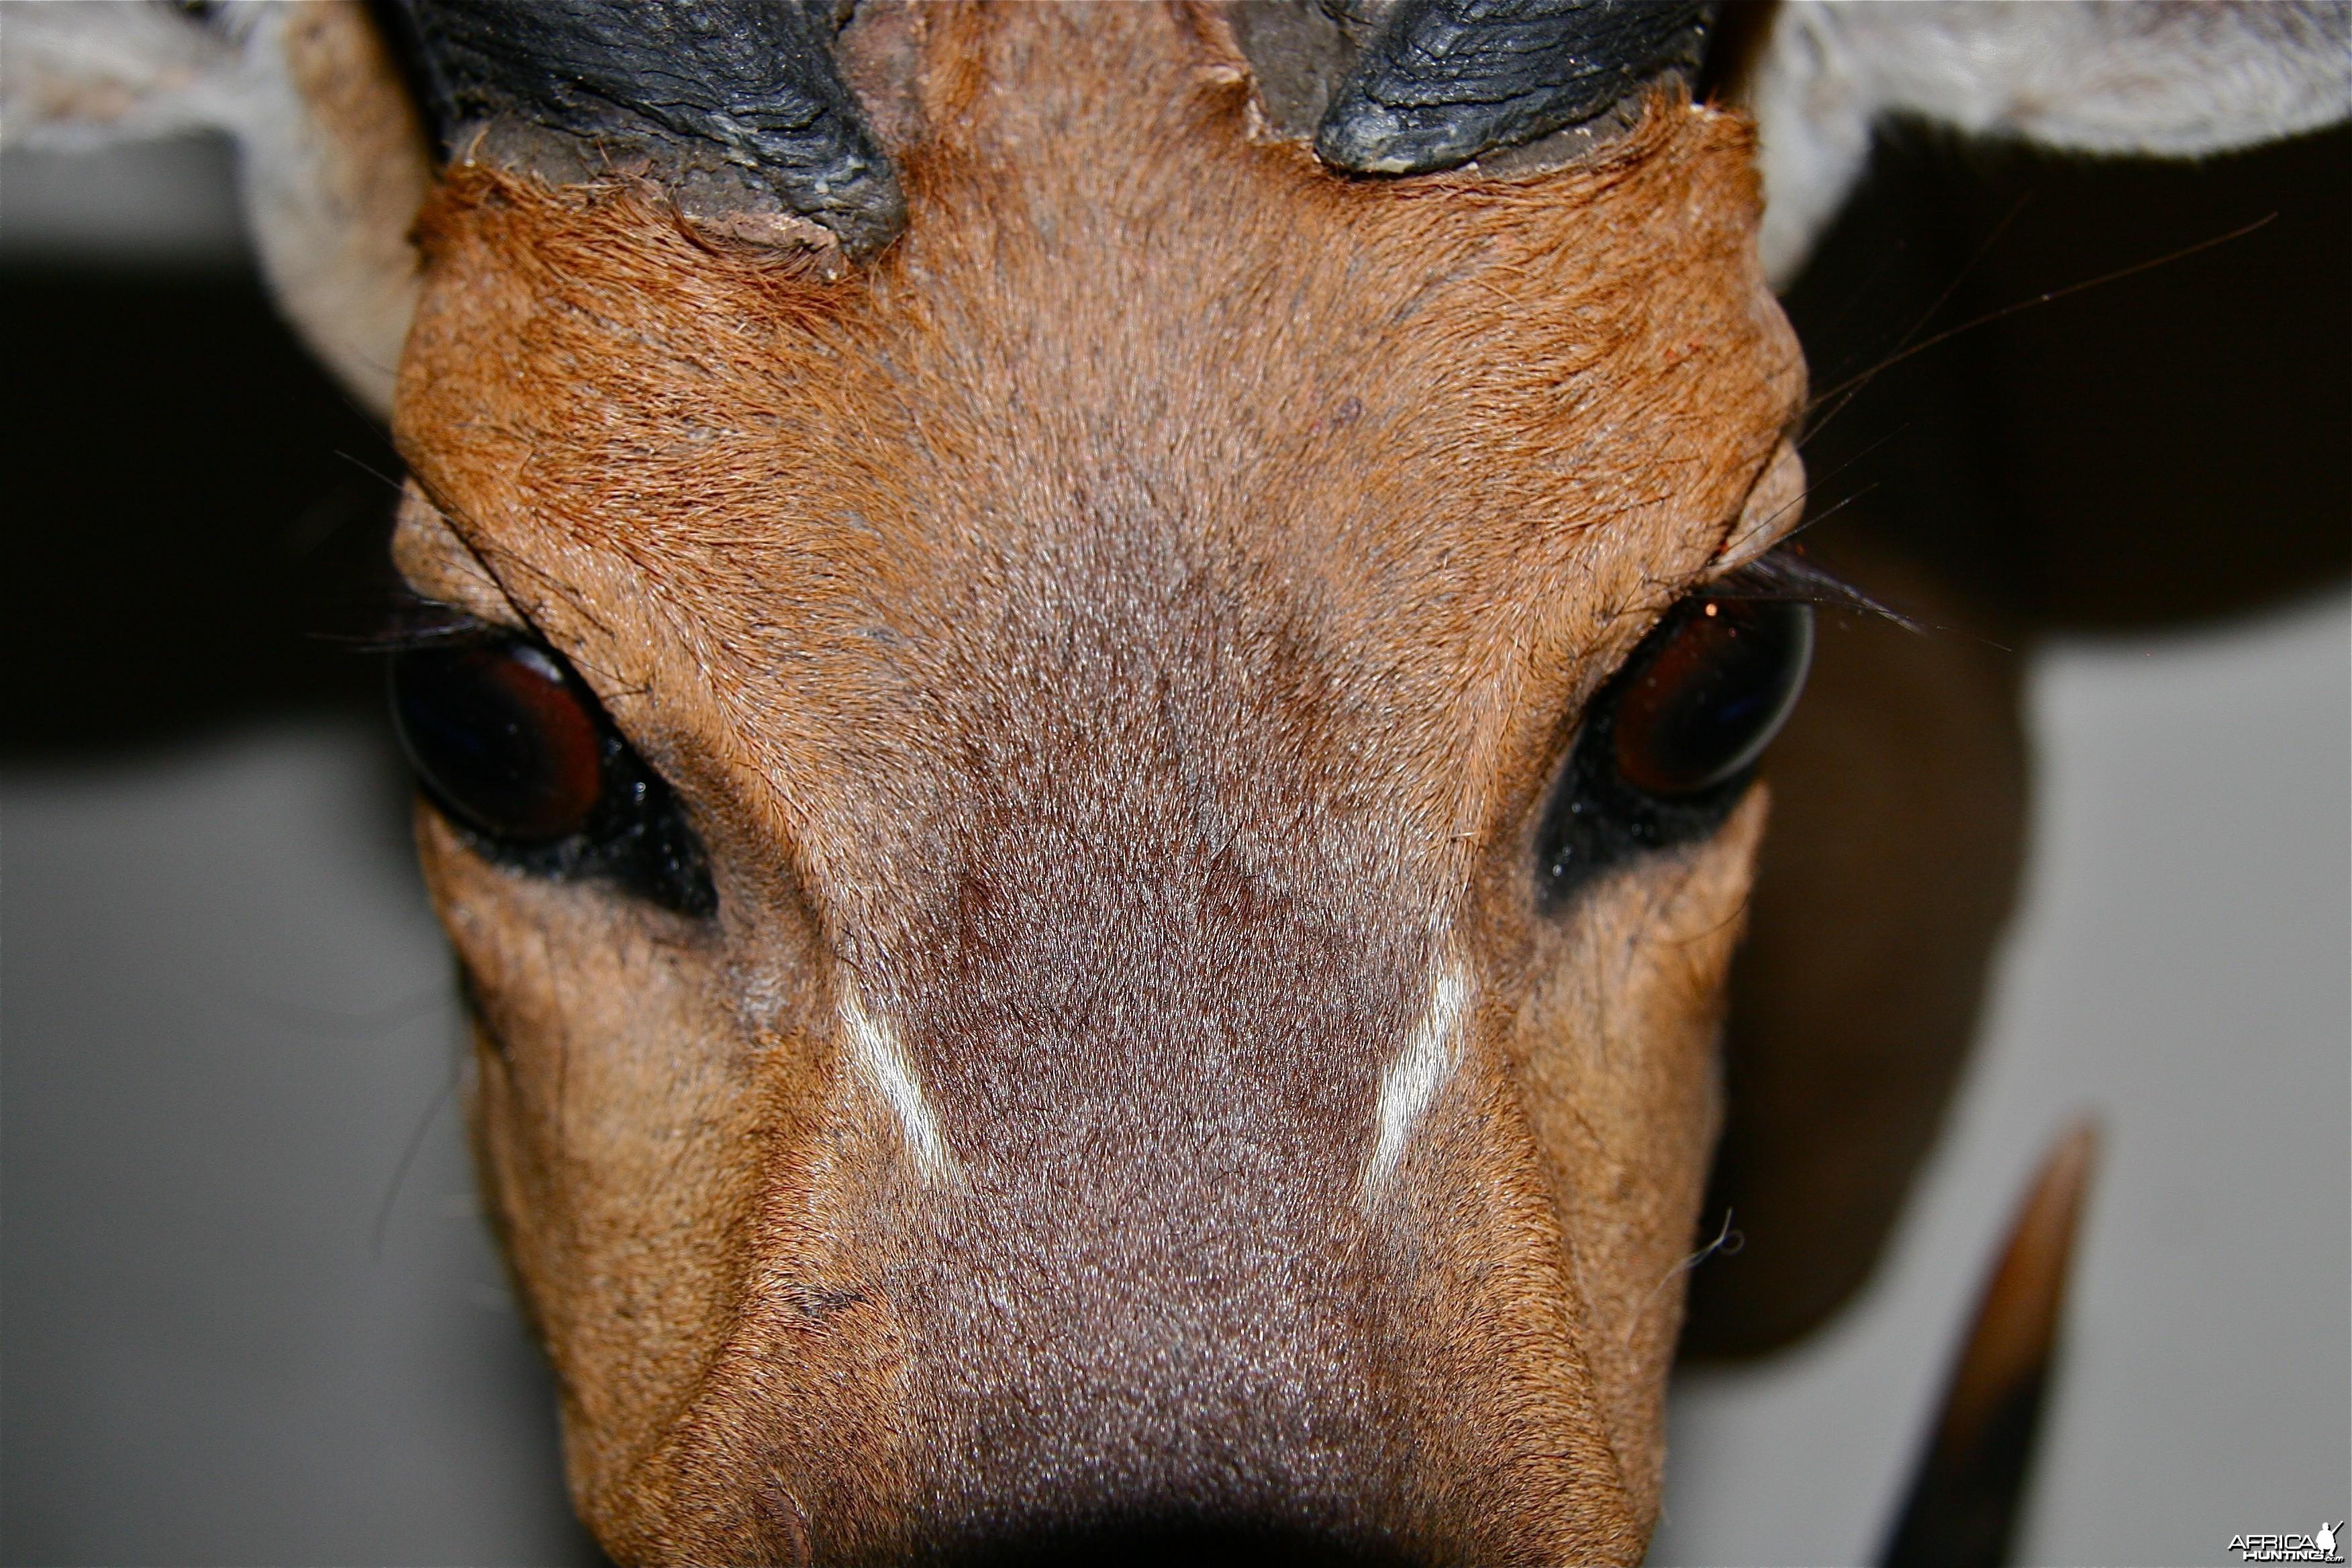 Bushbuck face